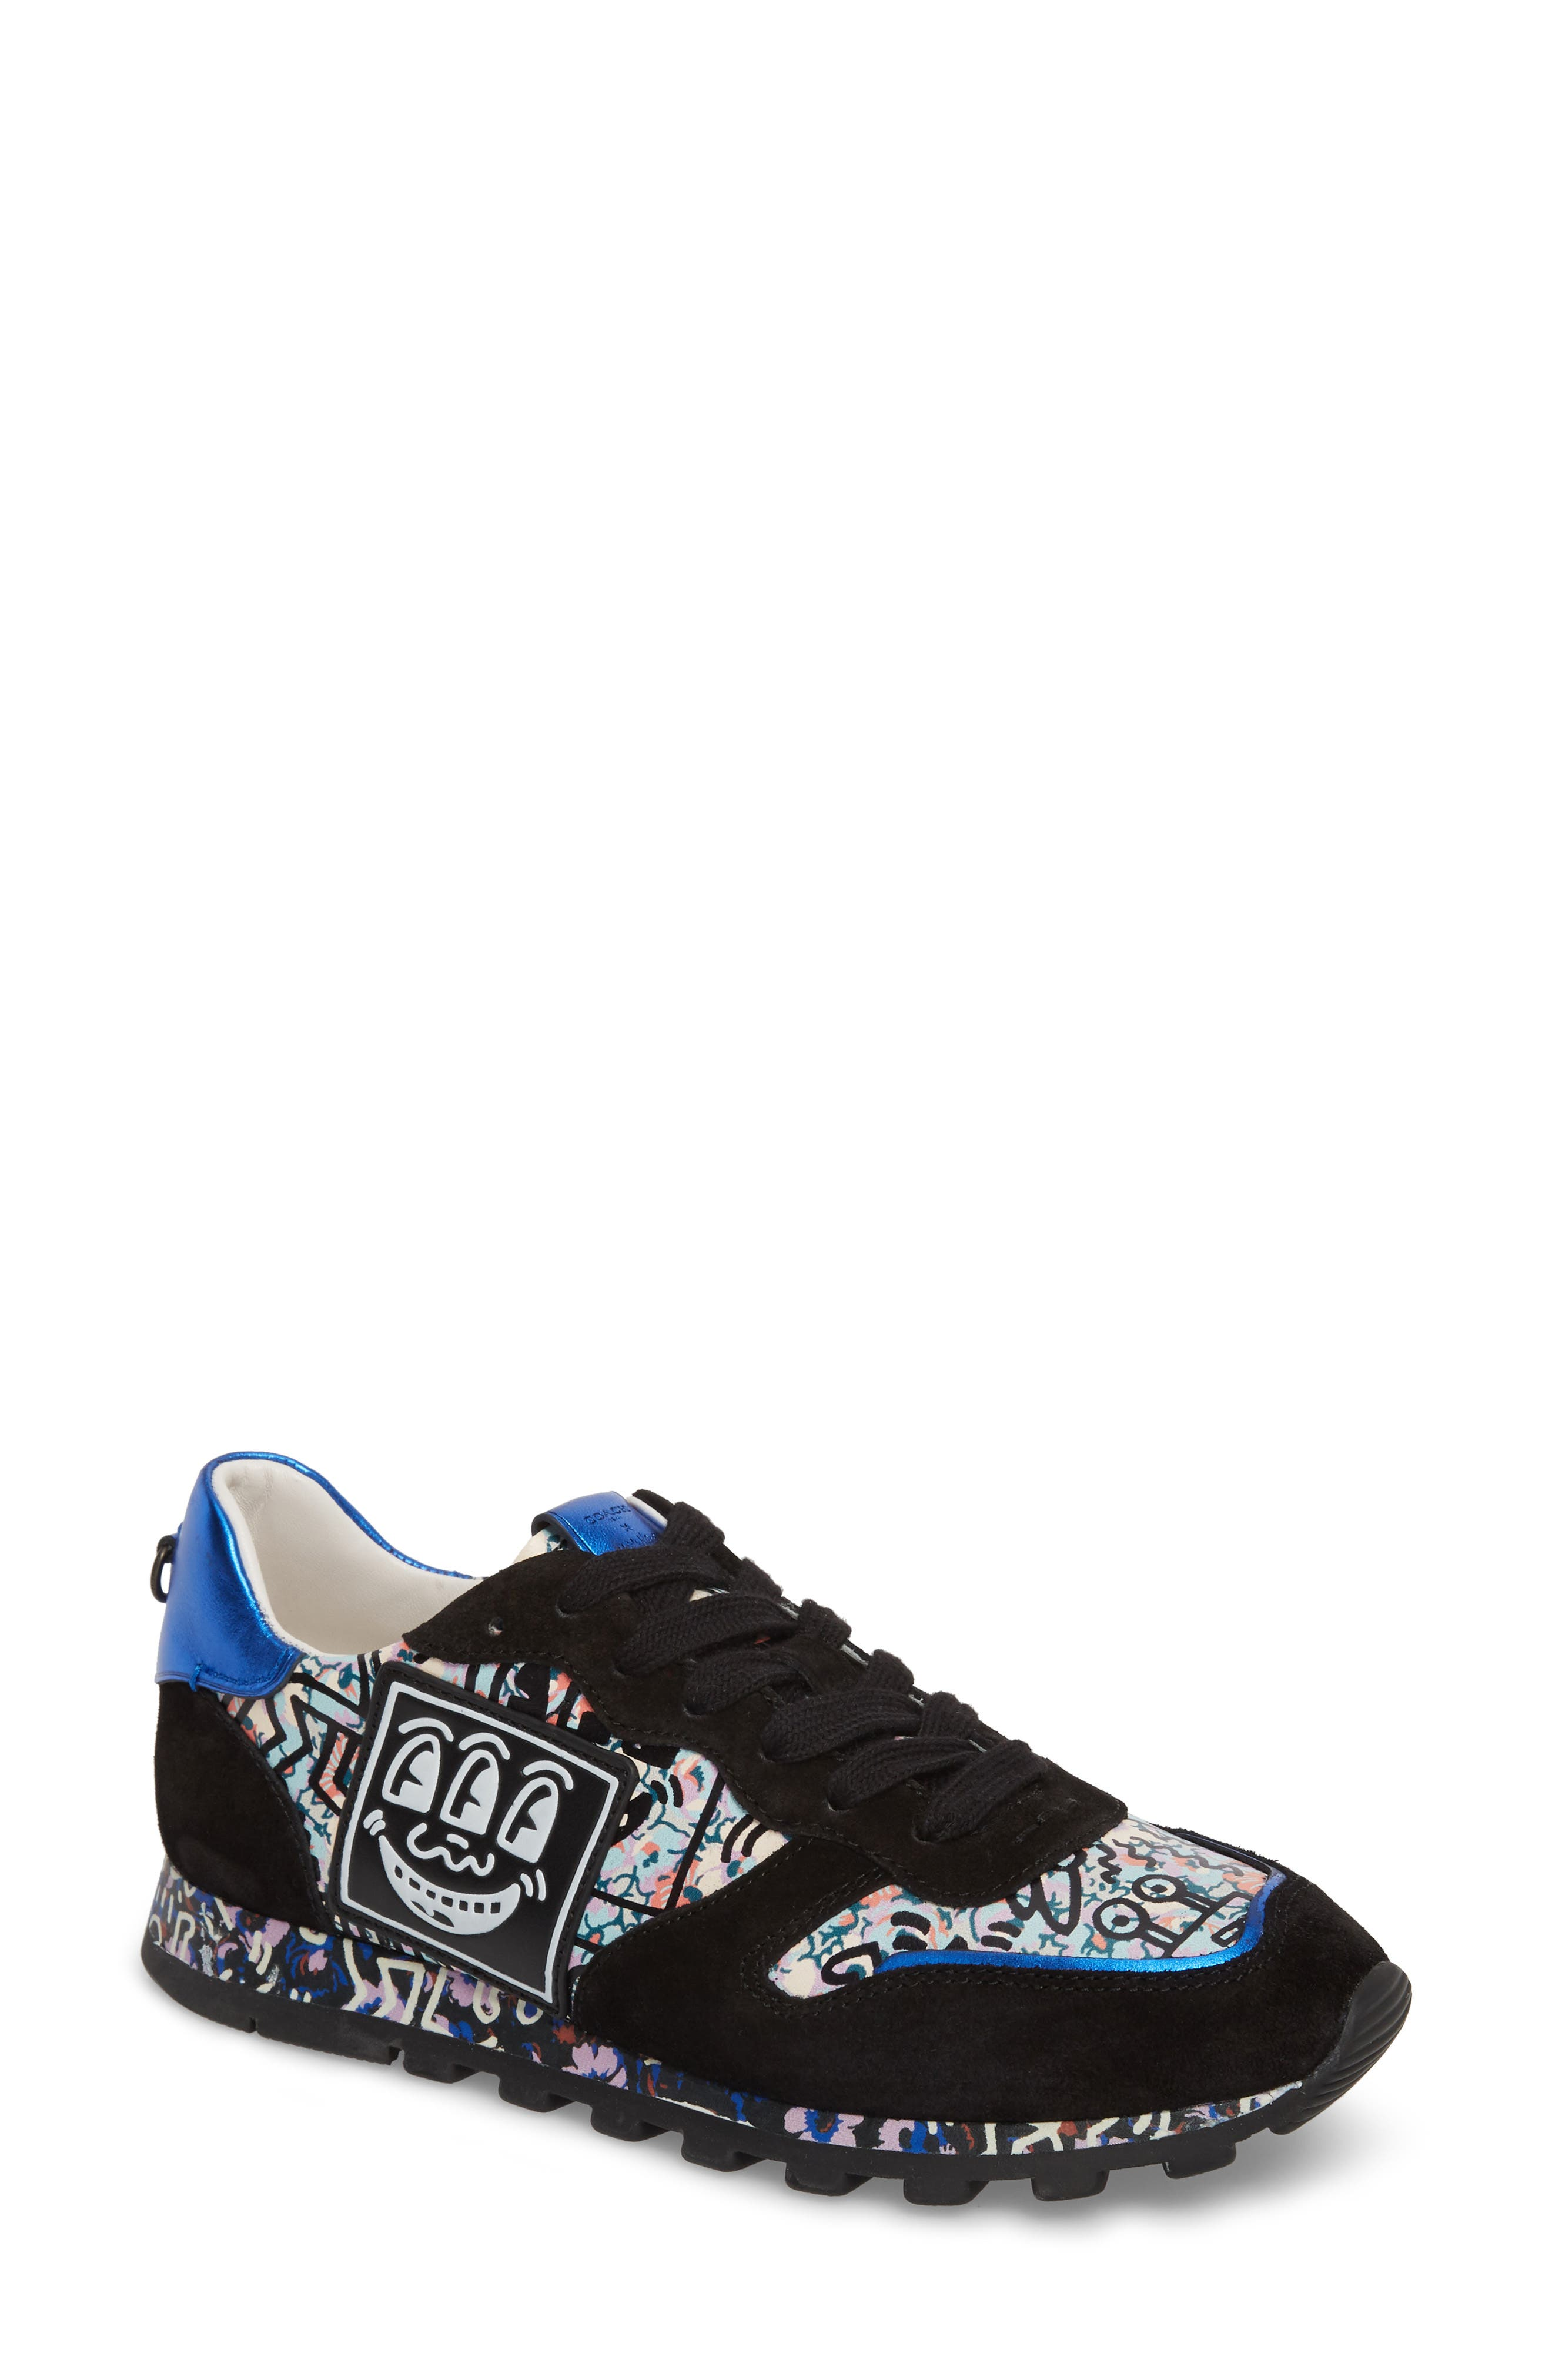 COACH x Keith Haring Graphic Sneaker (Women)